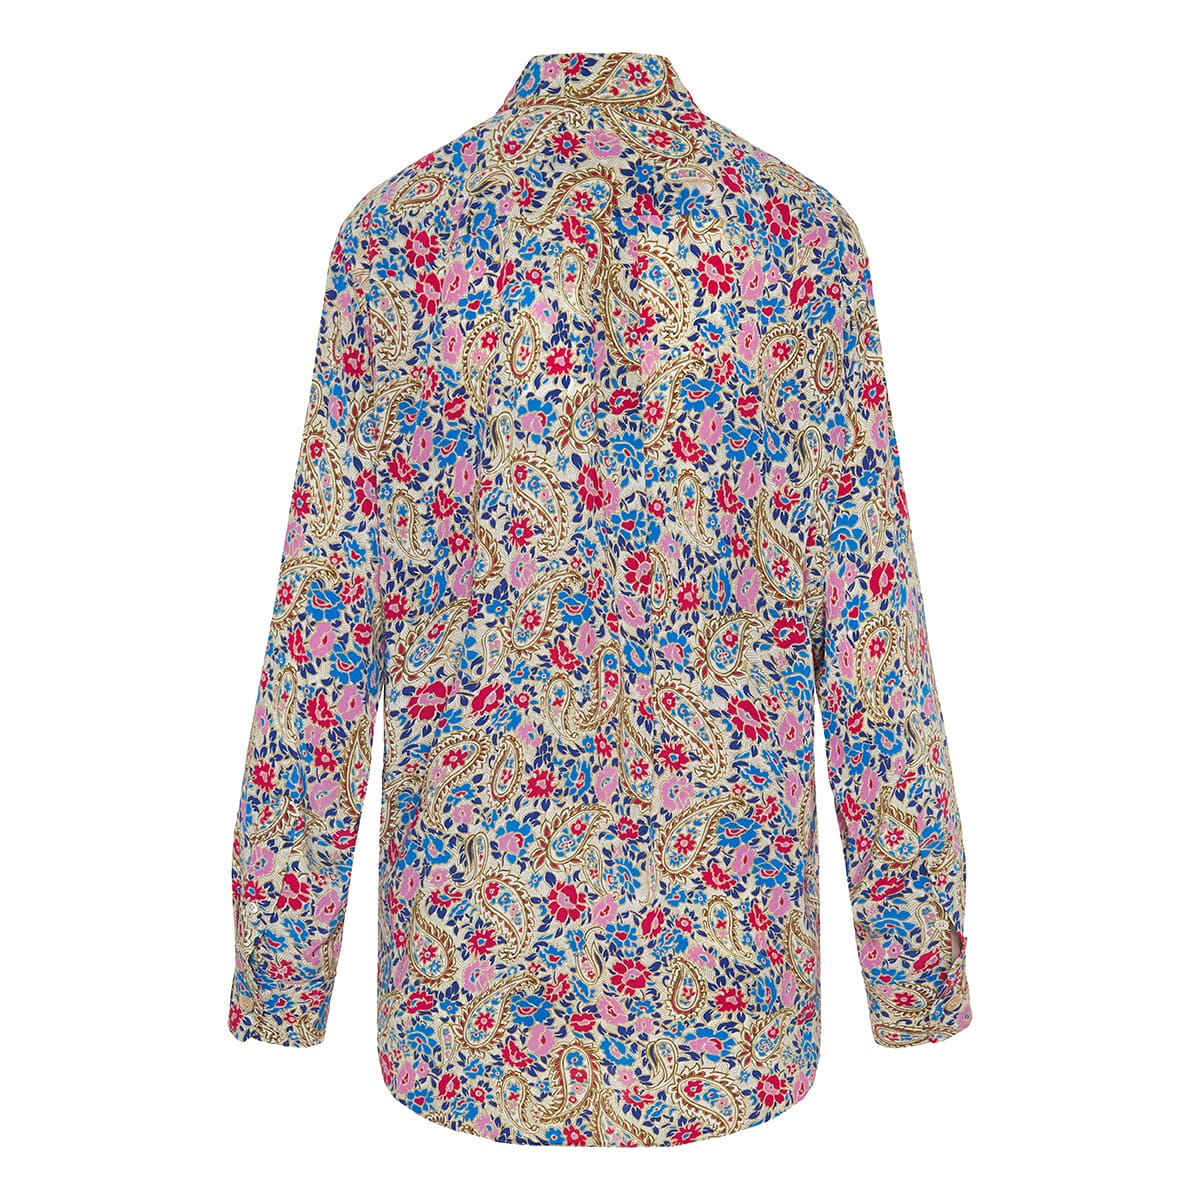 Paisley floral silk shirt